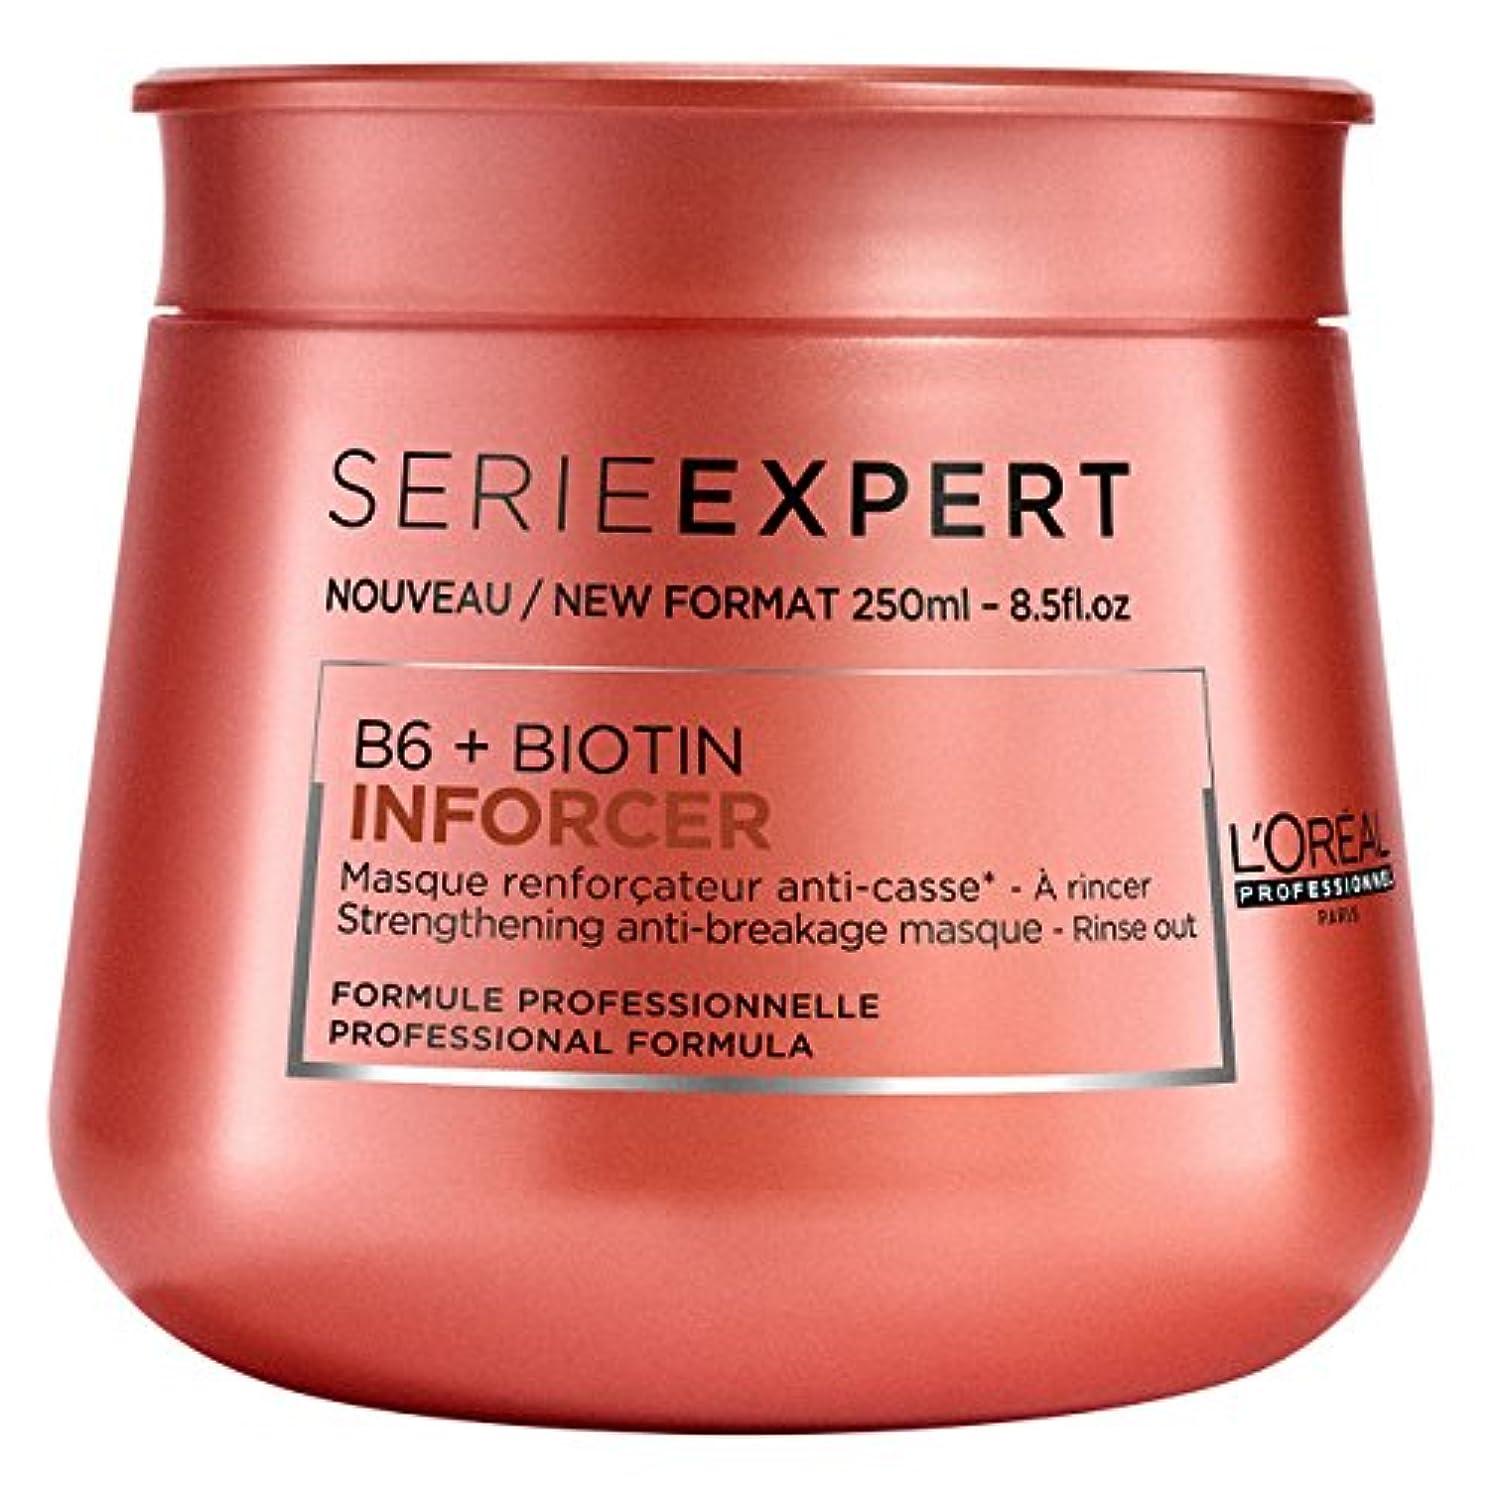 寝具死傷者前提条件L'Oreal Serie Expert B6 + Biotin INFORCER Strengthening Anti-Breakage Masque 250 ml [並行輸入品]